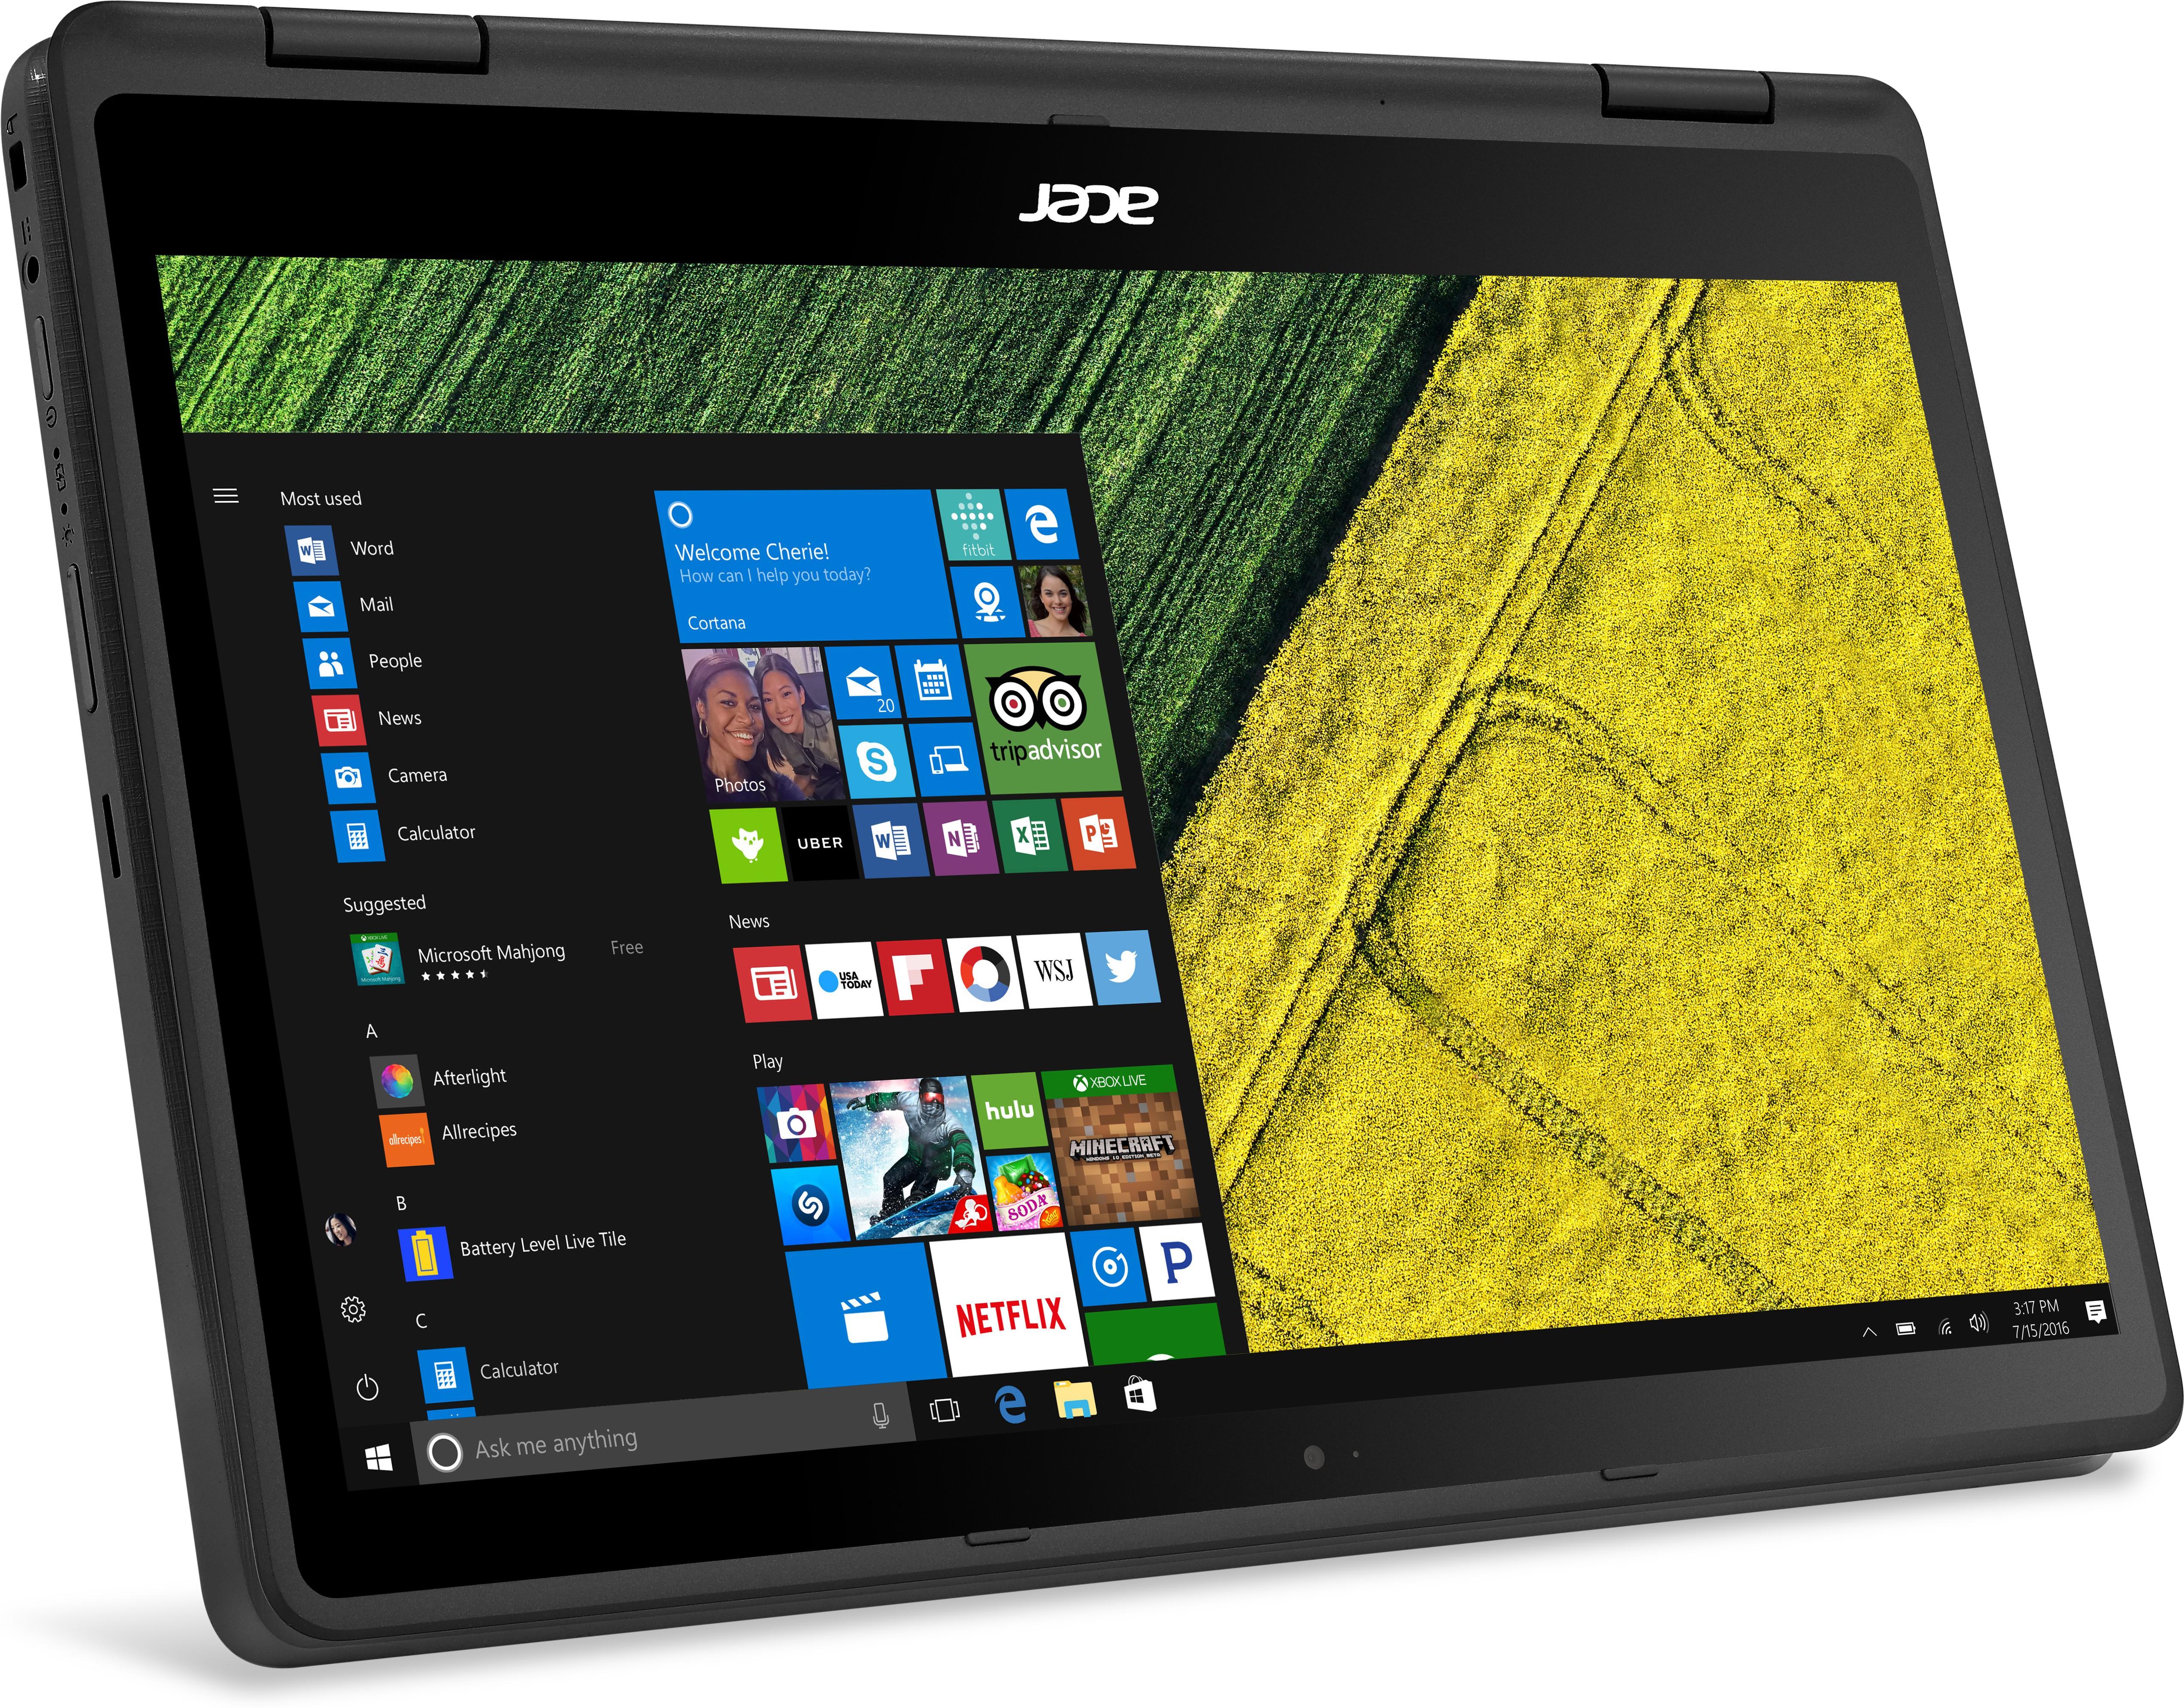 Acer Spin 5 Core i3 7th Gen - (4 GB/256 GB SSD/Windows 10 Home) SP513-51 2 in 1 Laptop(13.3 inch, Black, 1.6 kg) (Acer) Tamil Nadu Buy Online